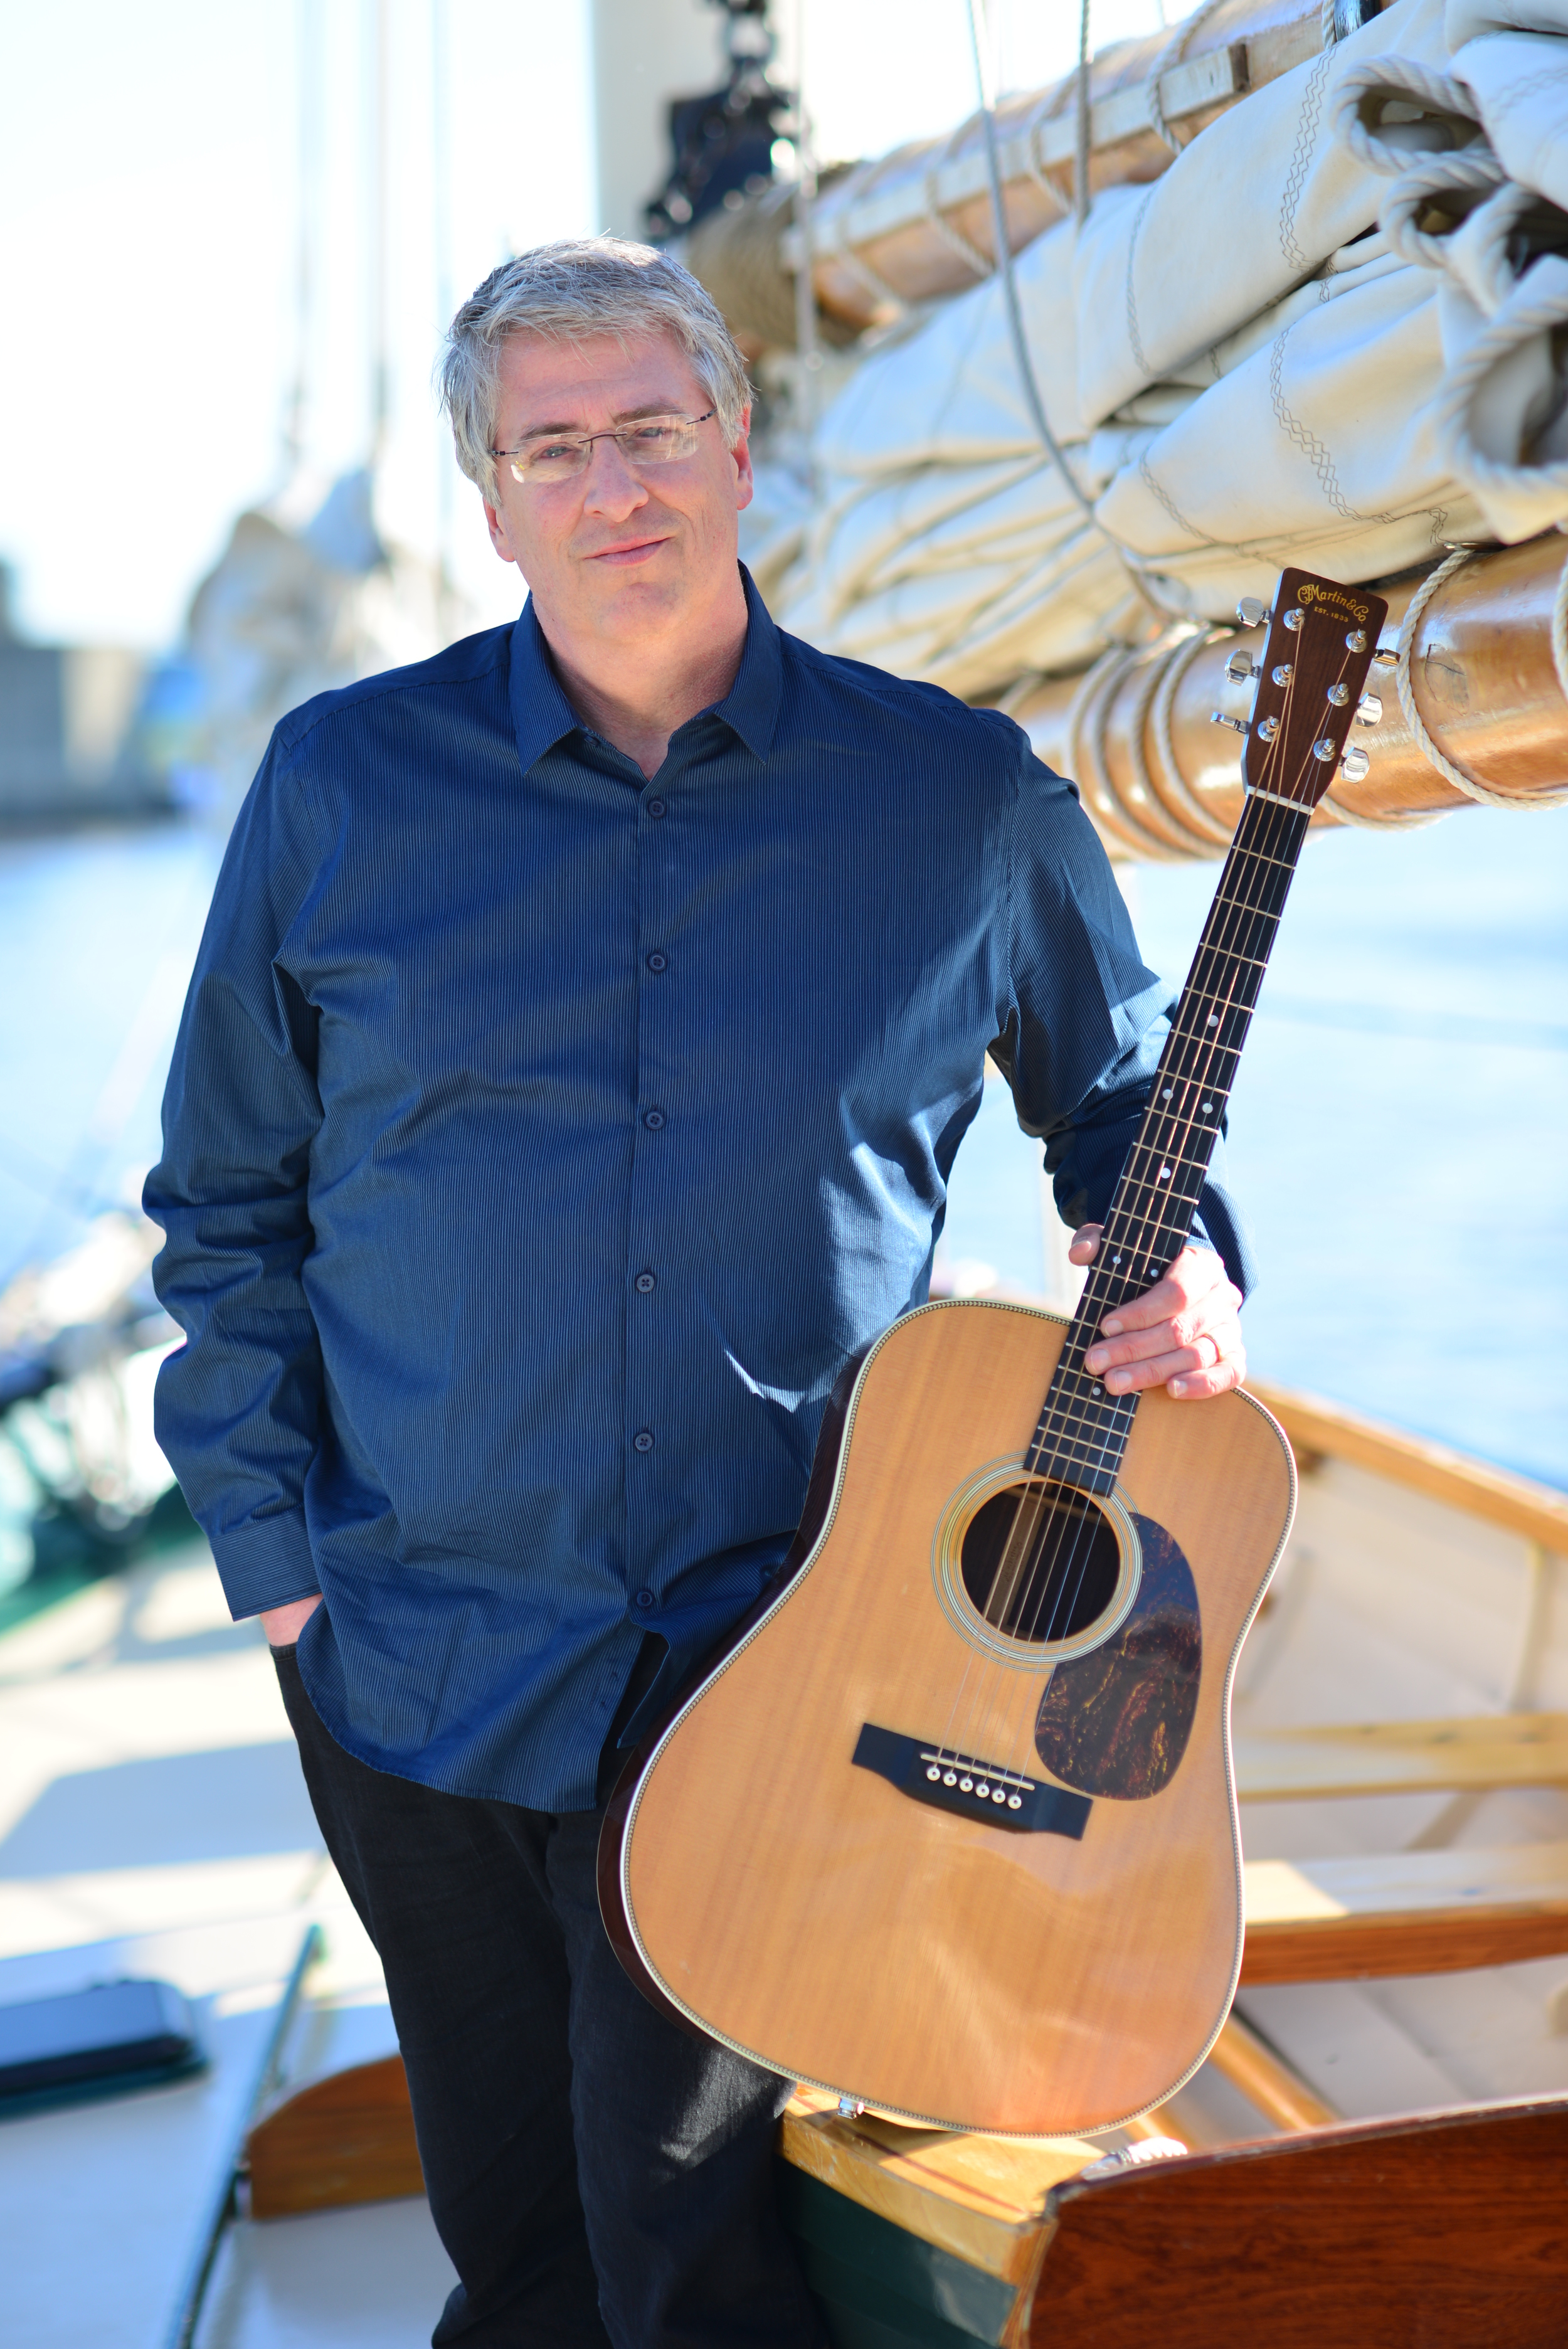 Dan Hall on board the Appledore schooner. Photo credit Michael Robb